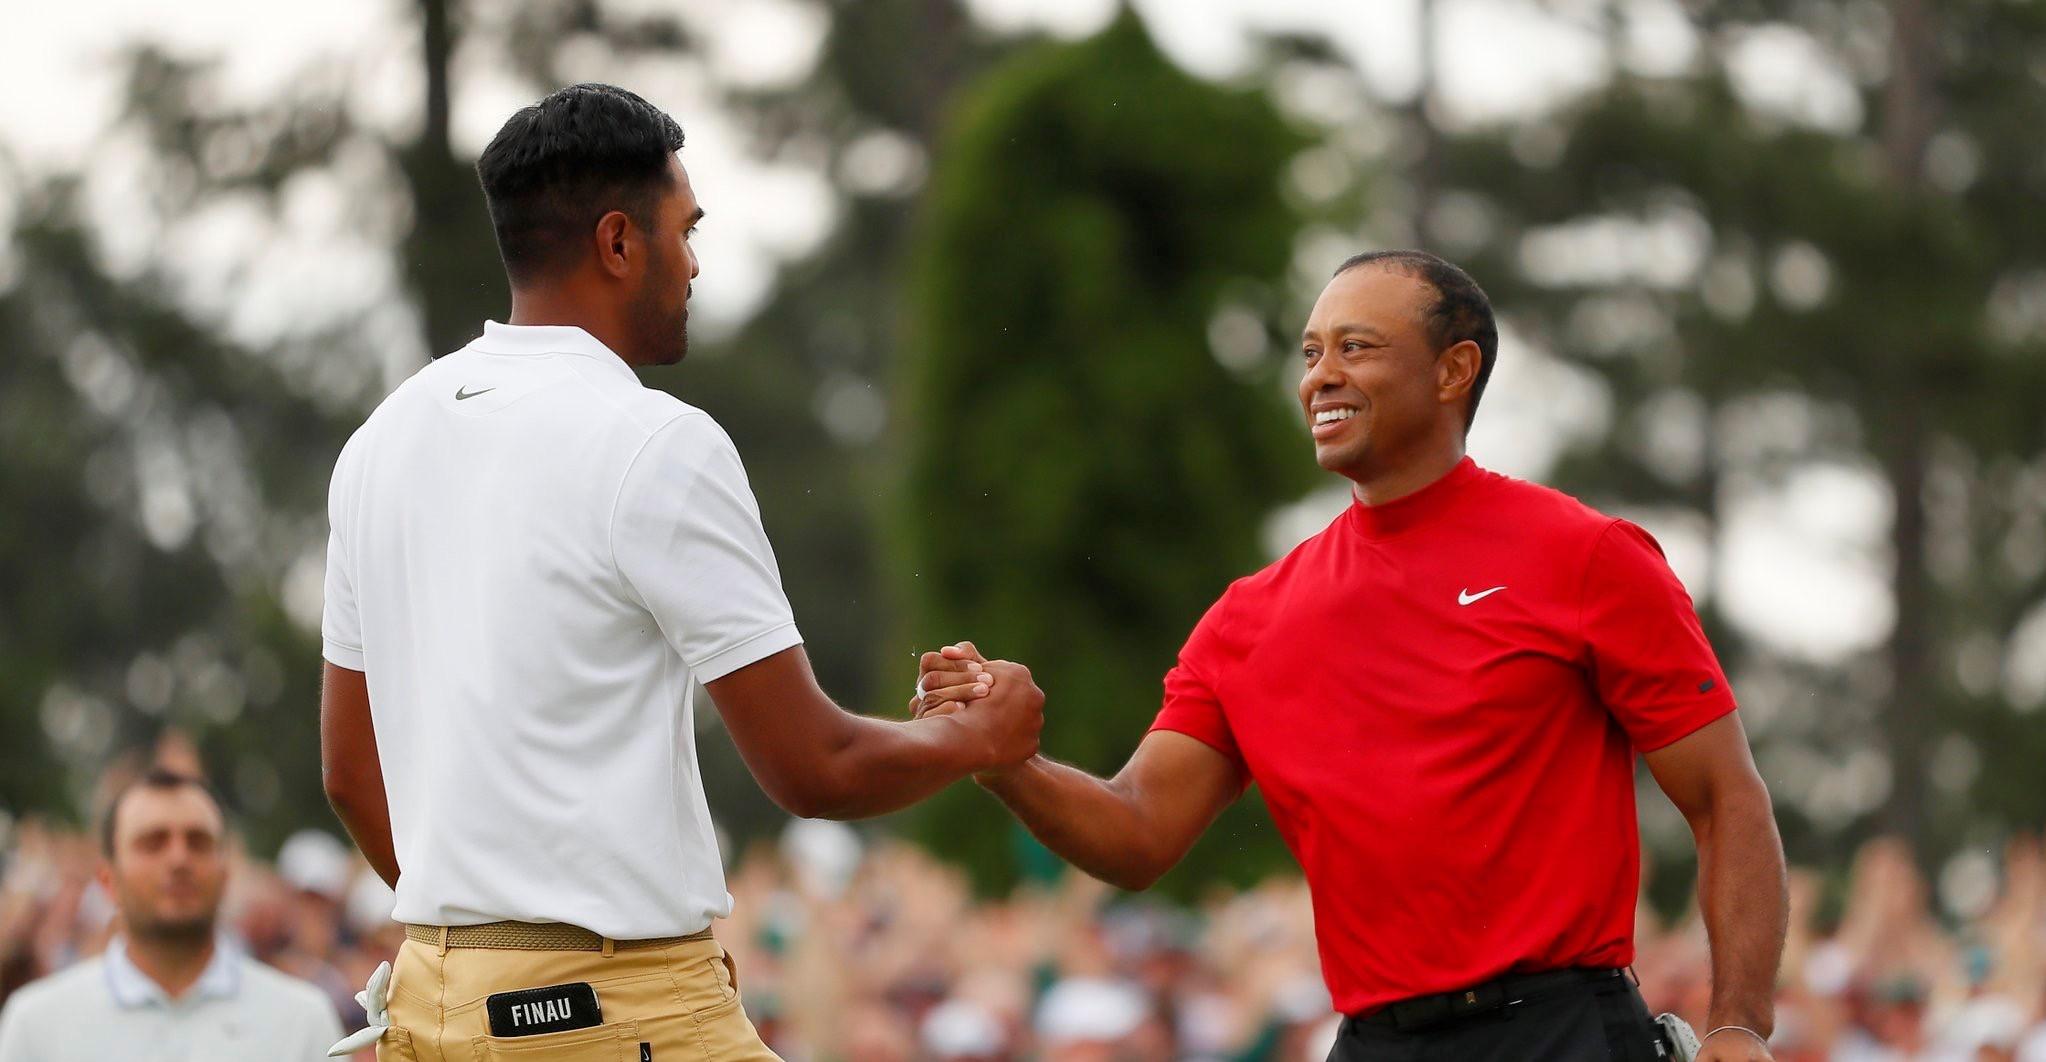 Tony Finau and Tiger Woods 2